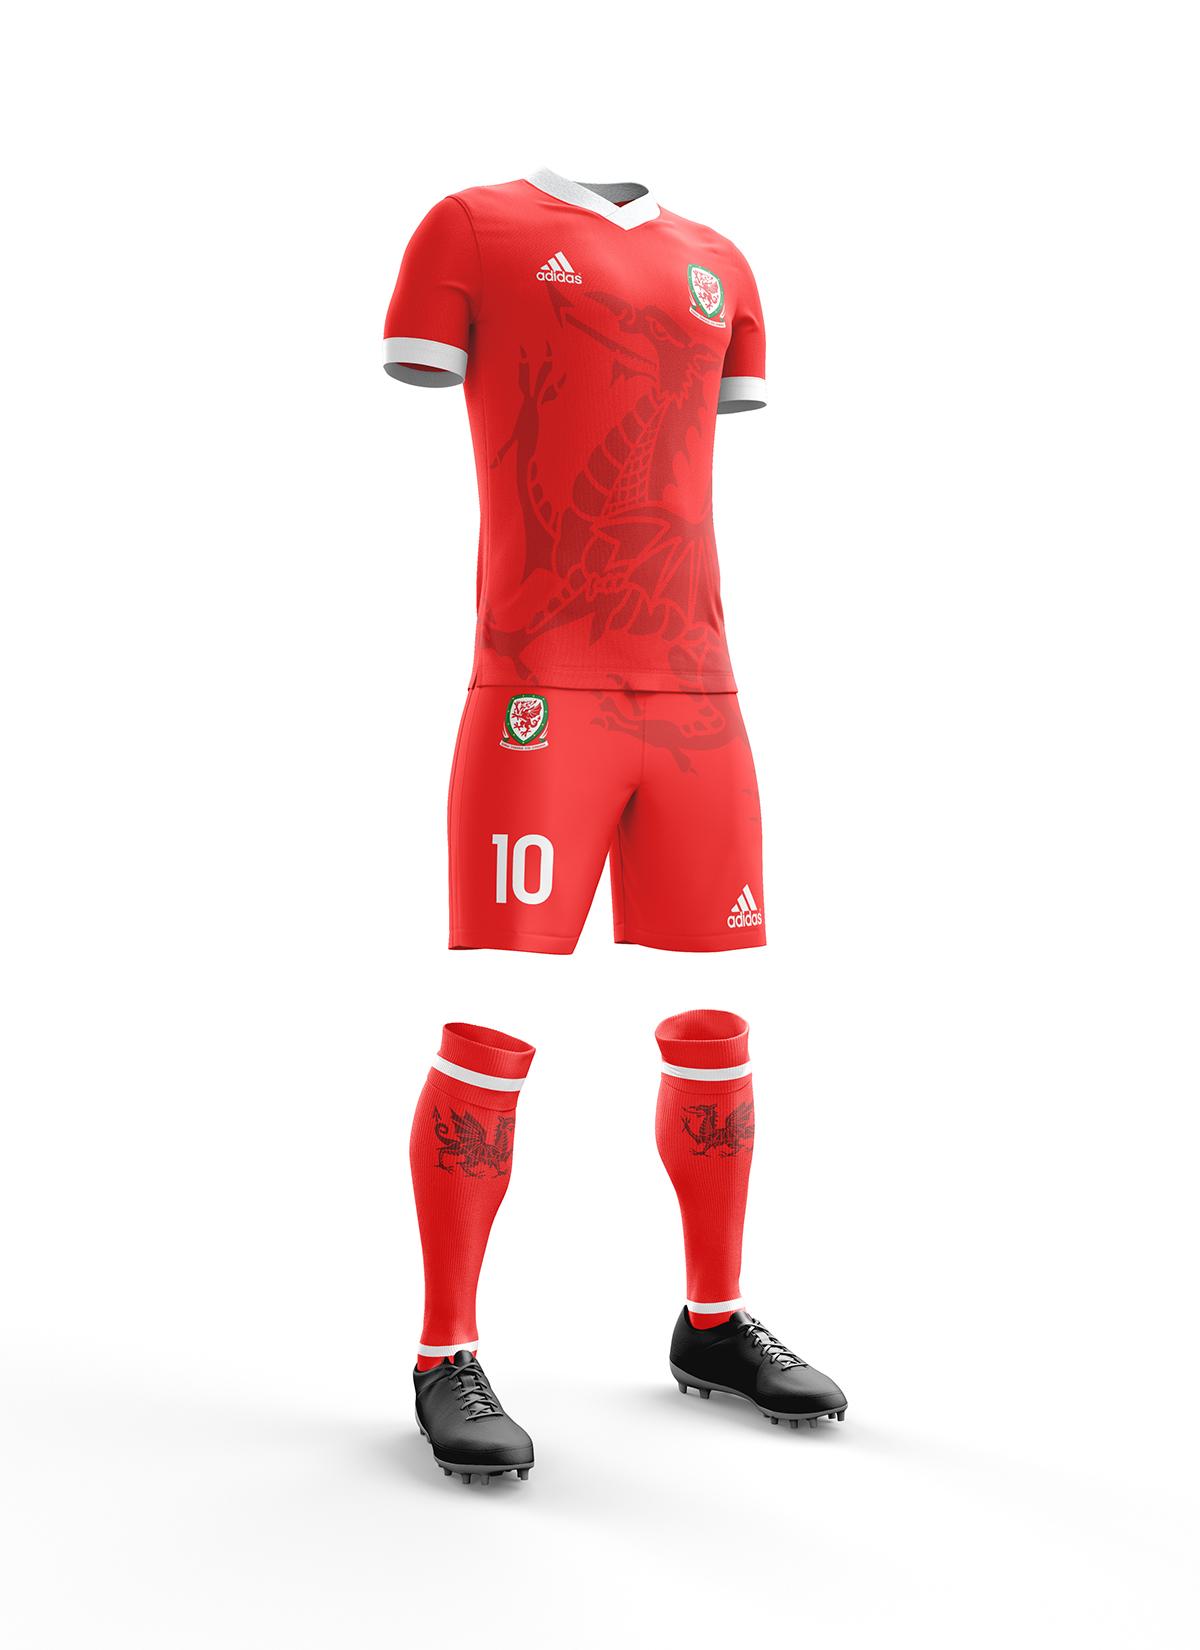 08cd2a74347 wales football kit 2017/18 design on Behance